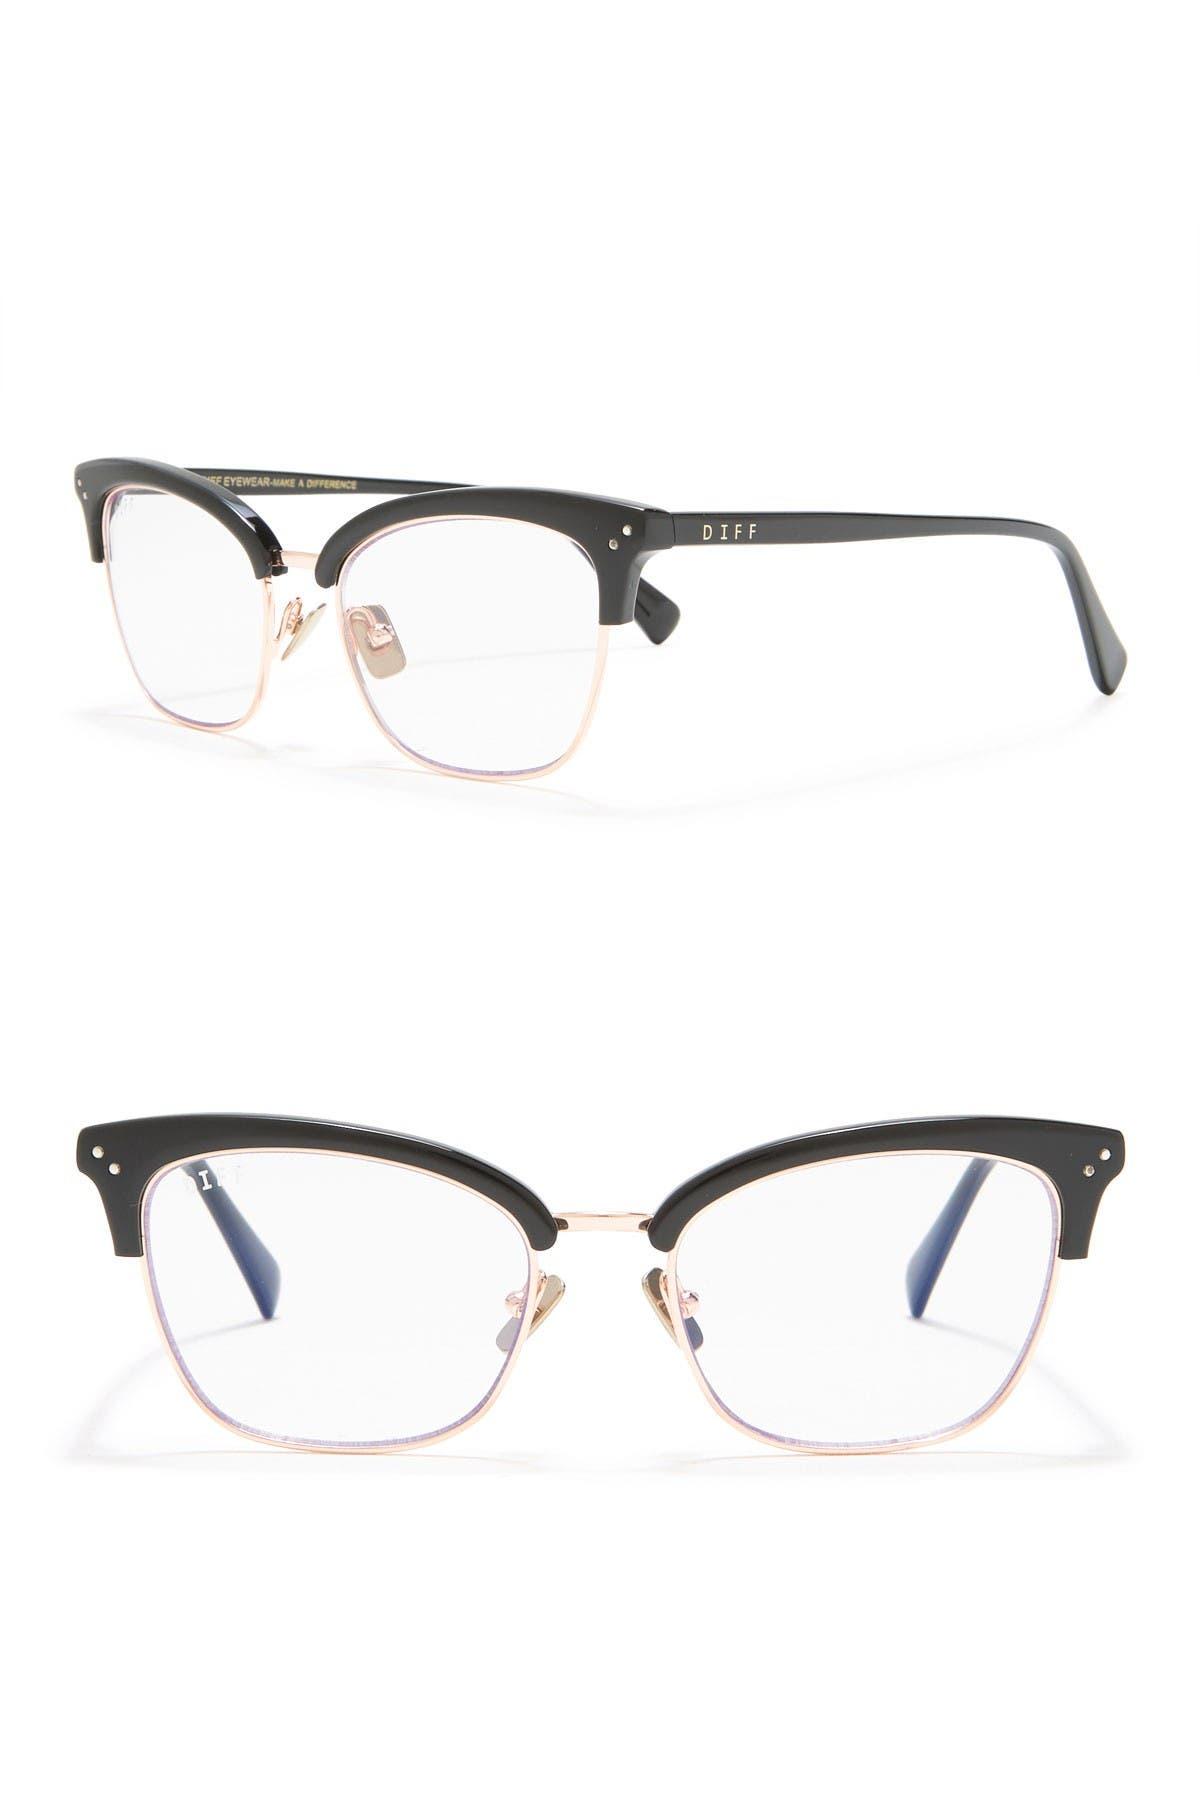 Image of DIFF Eyewear Lucy 51mm Cat Eye Blue Light Blocking Glasses